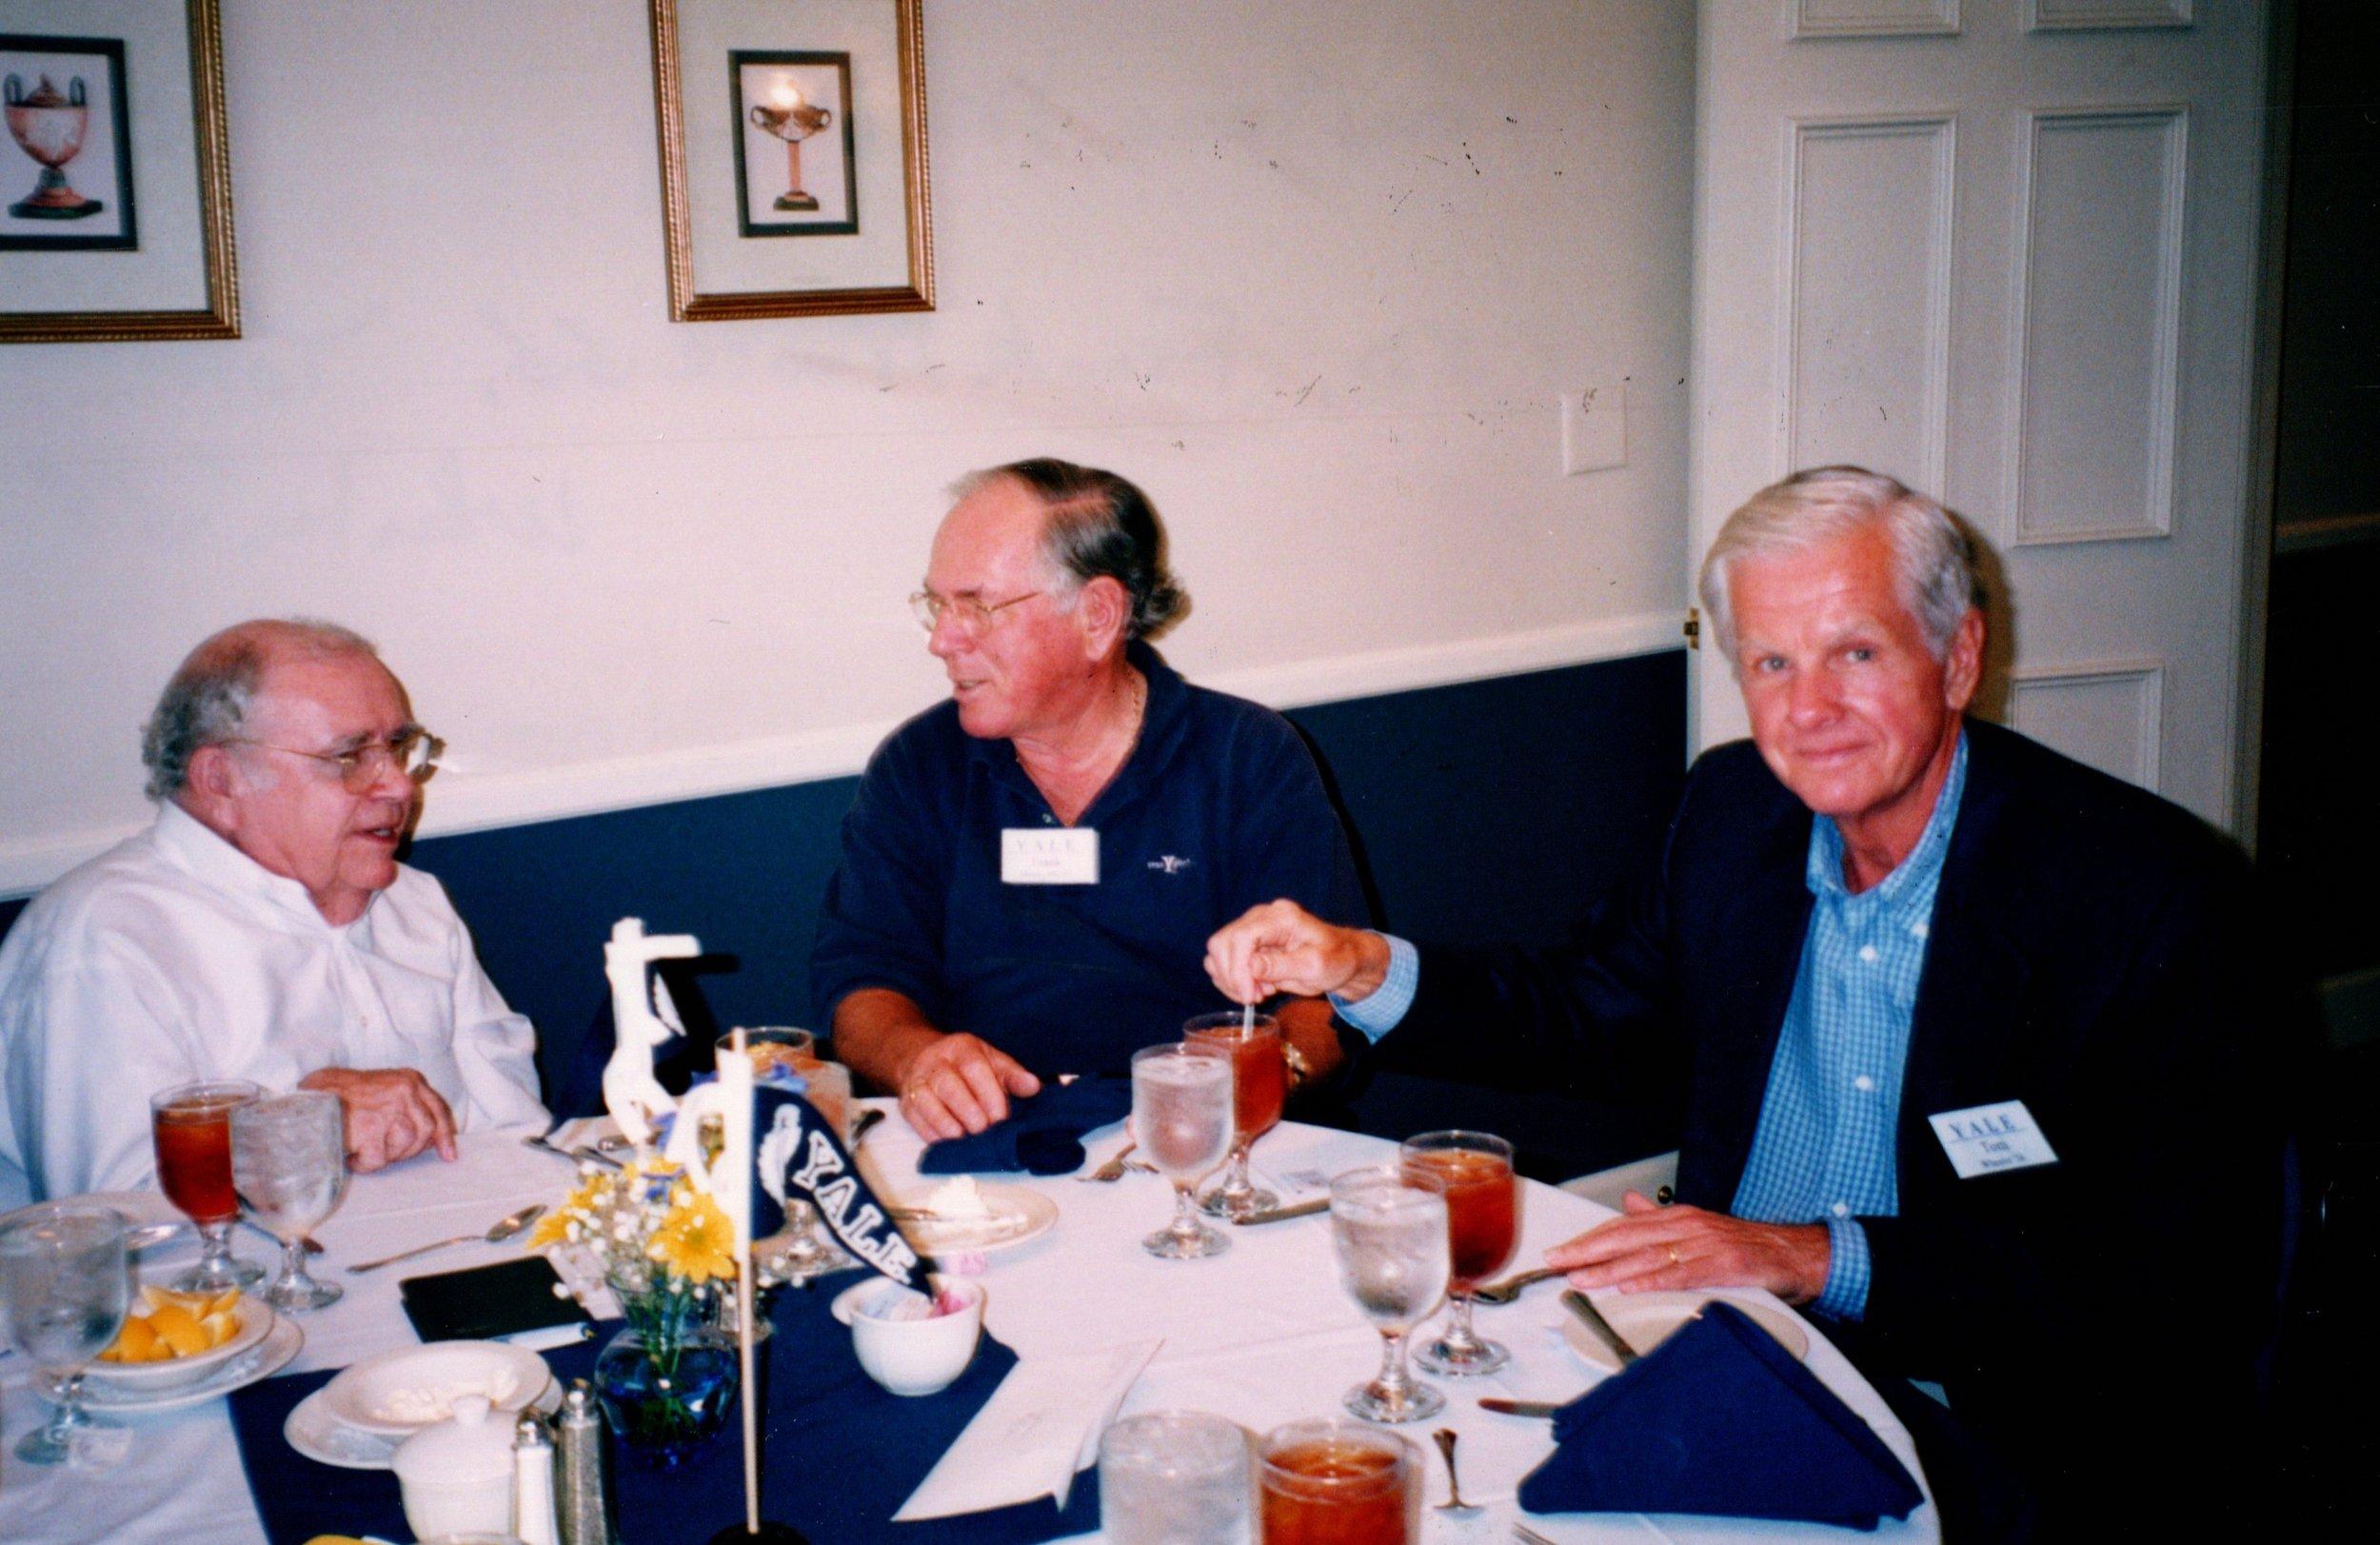 4_10_2003 - SEMI - ANNUAL TRUSTEES MEETING - COLLIER ATHLECTICS CLUB 4.jpg